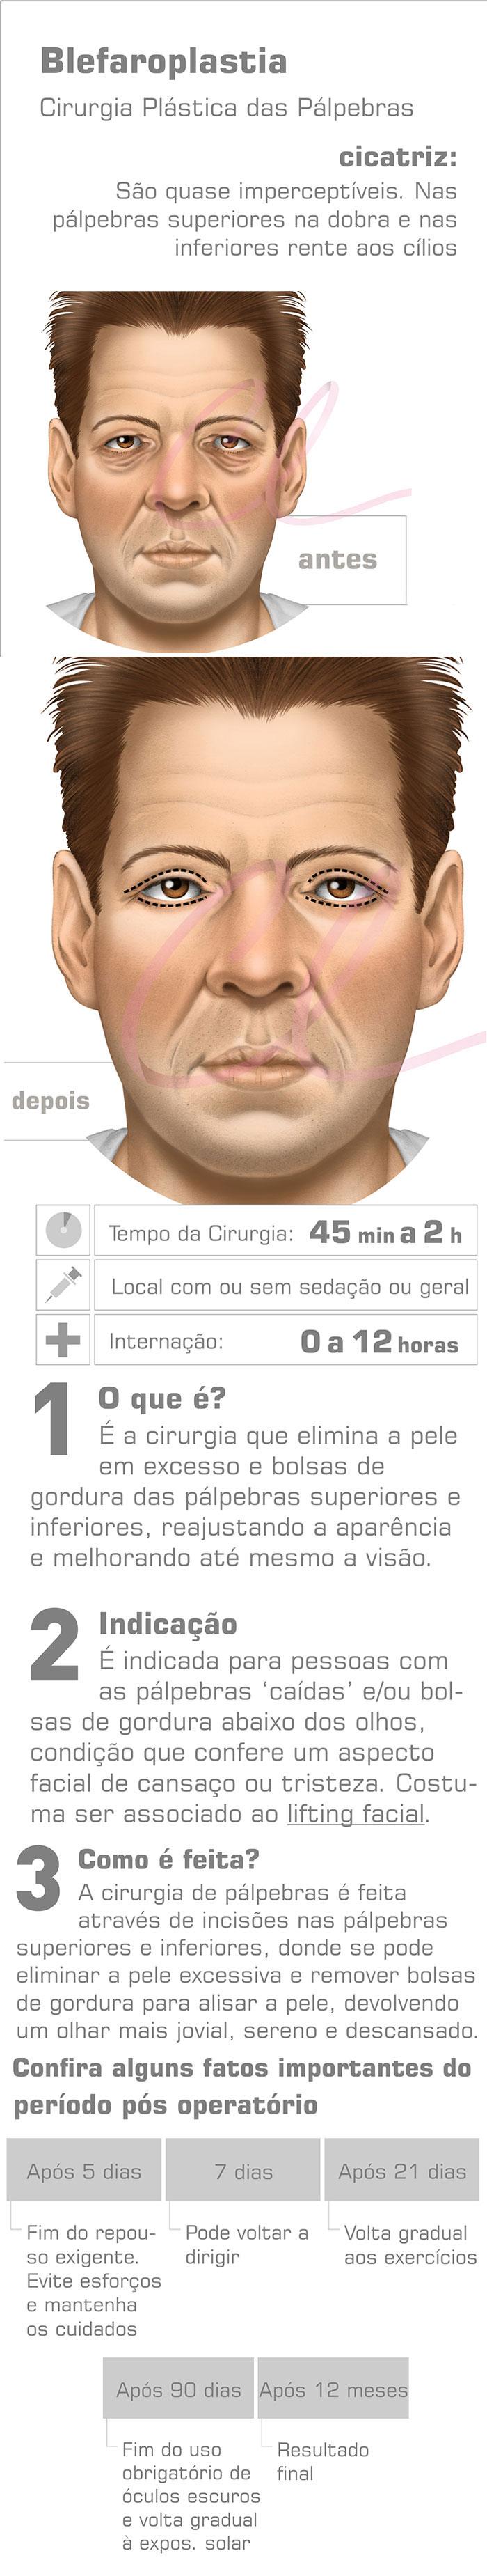 Cirurgia de Pálpebras (Blefaroplastia)